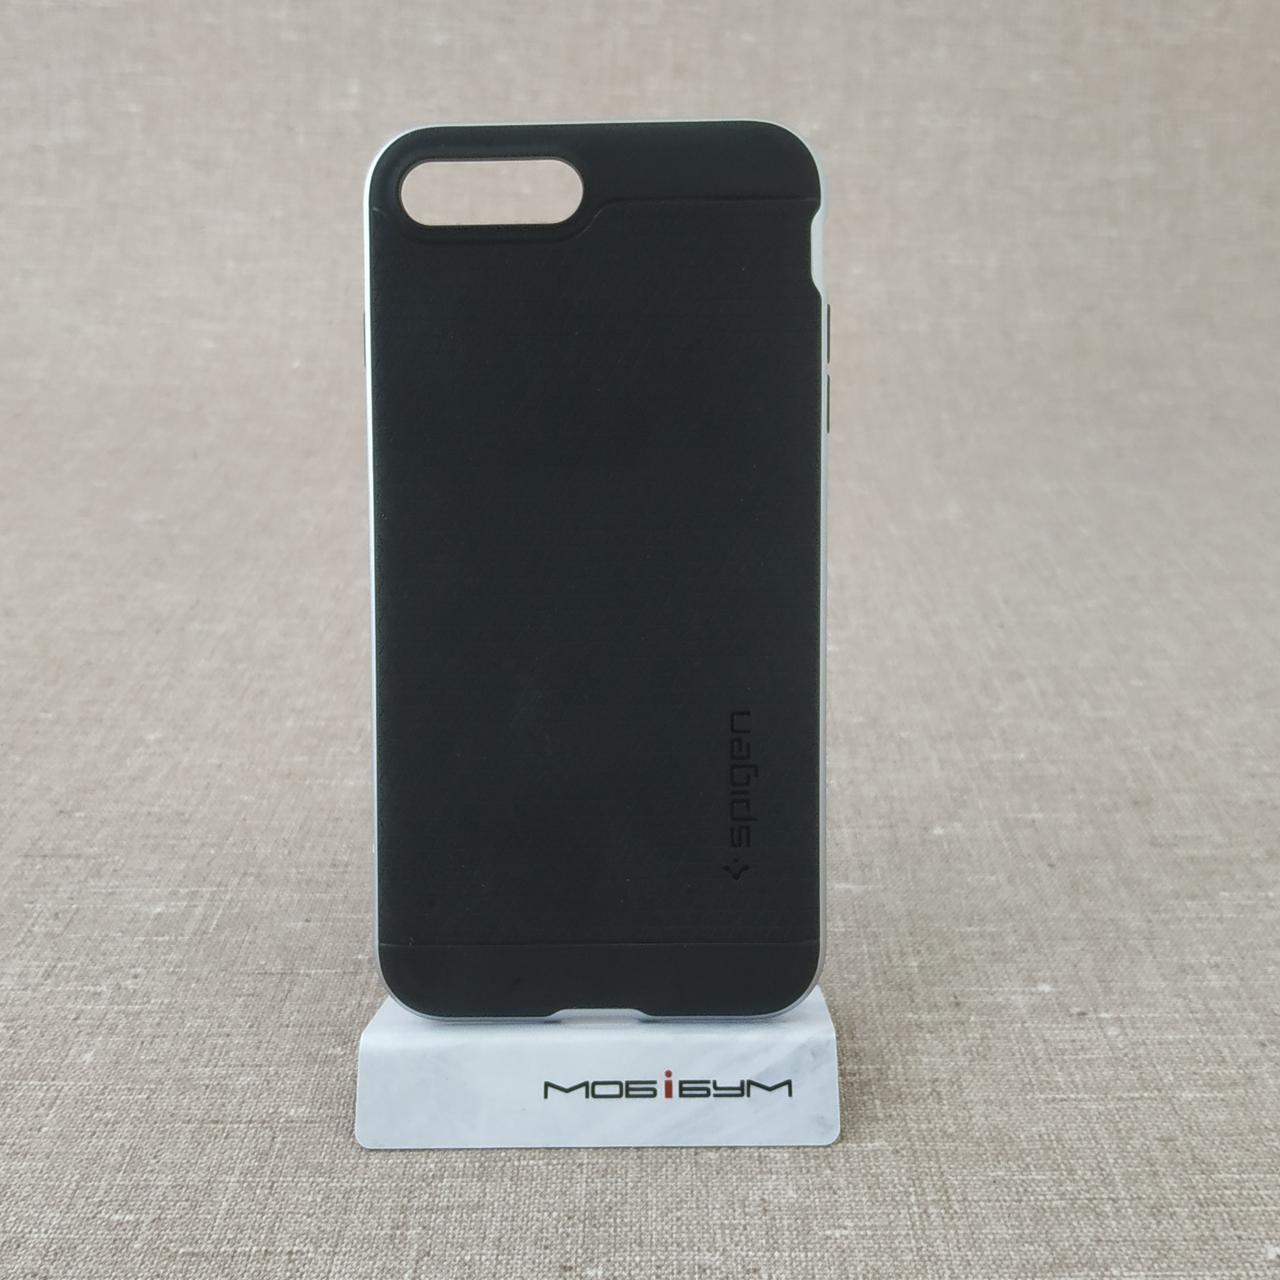 Чехол Spigen Neo Hybrid iPhone 8 Plus/7 Plus satin silver (43CS20537) EAN/UPC: 8809466646539